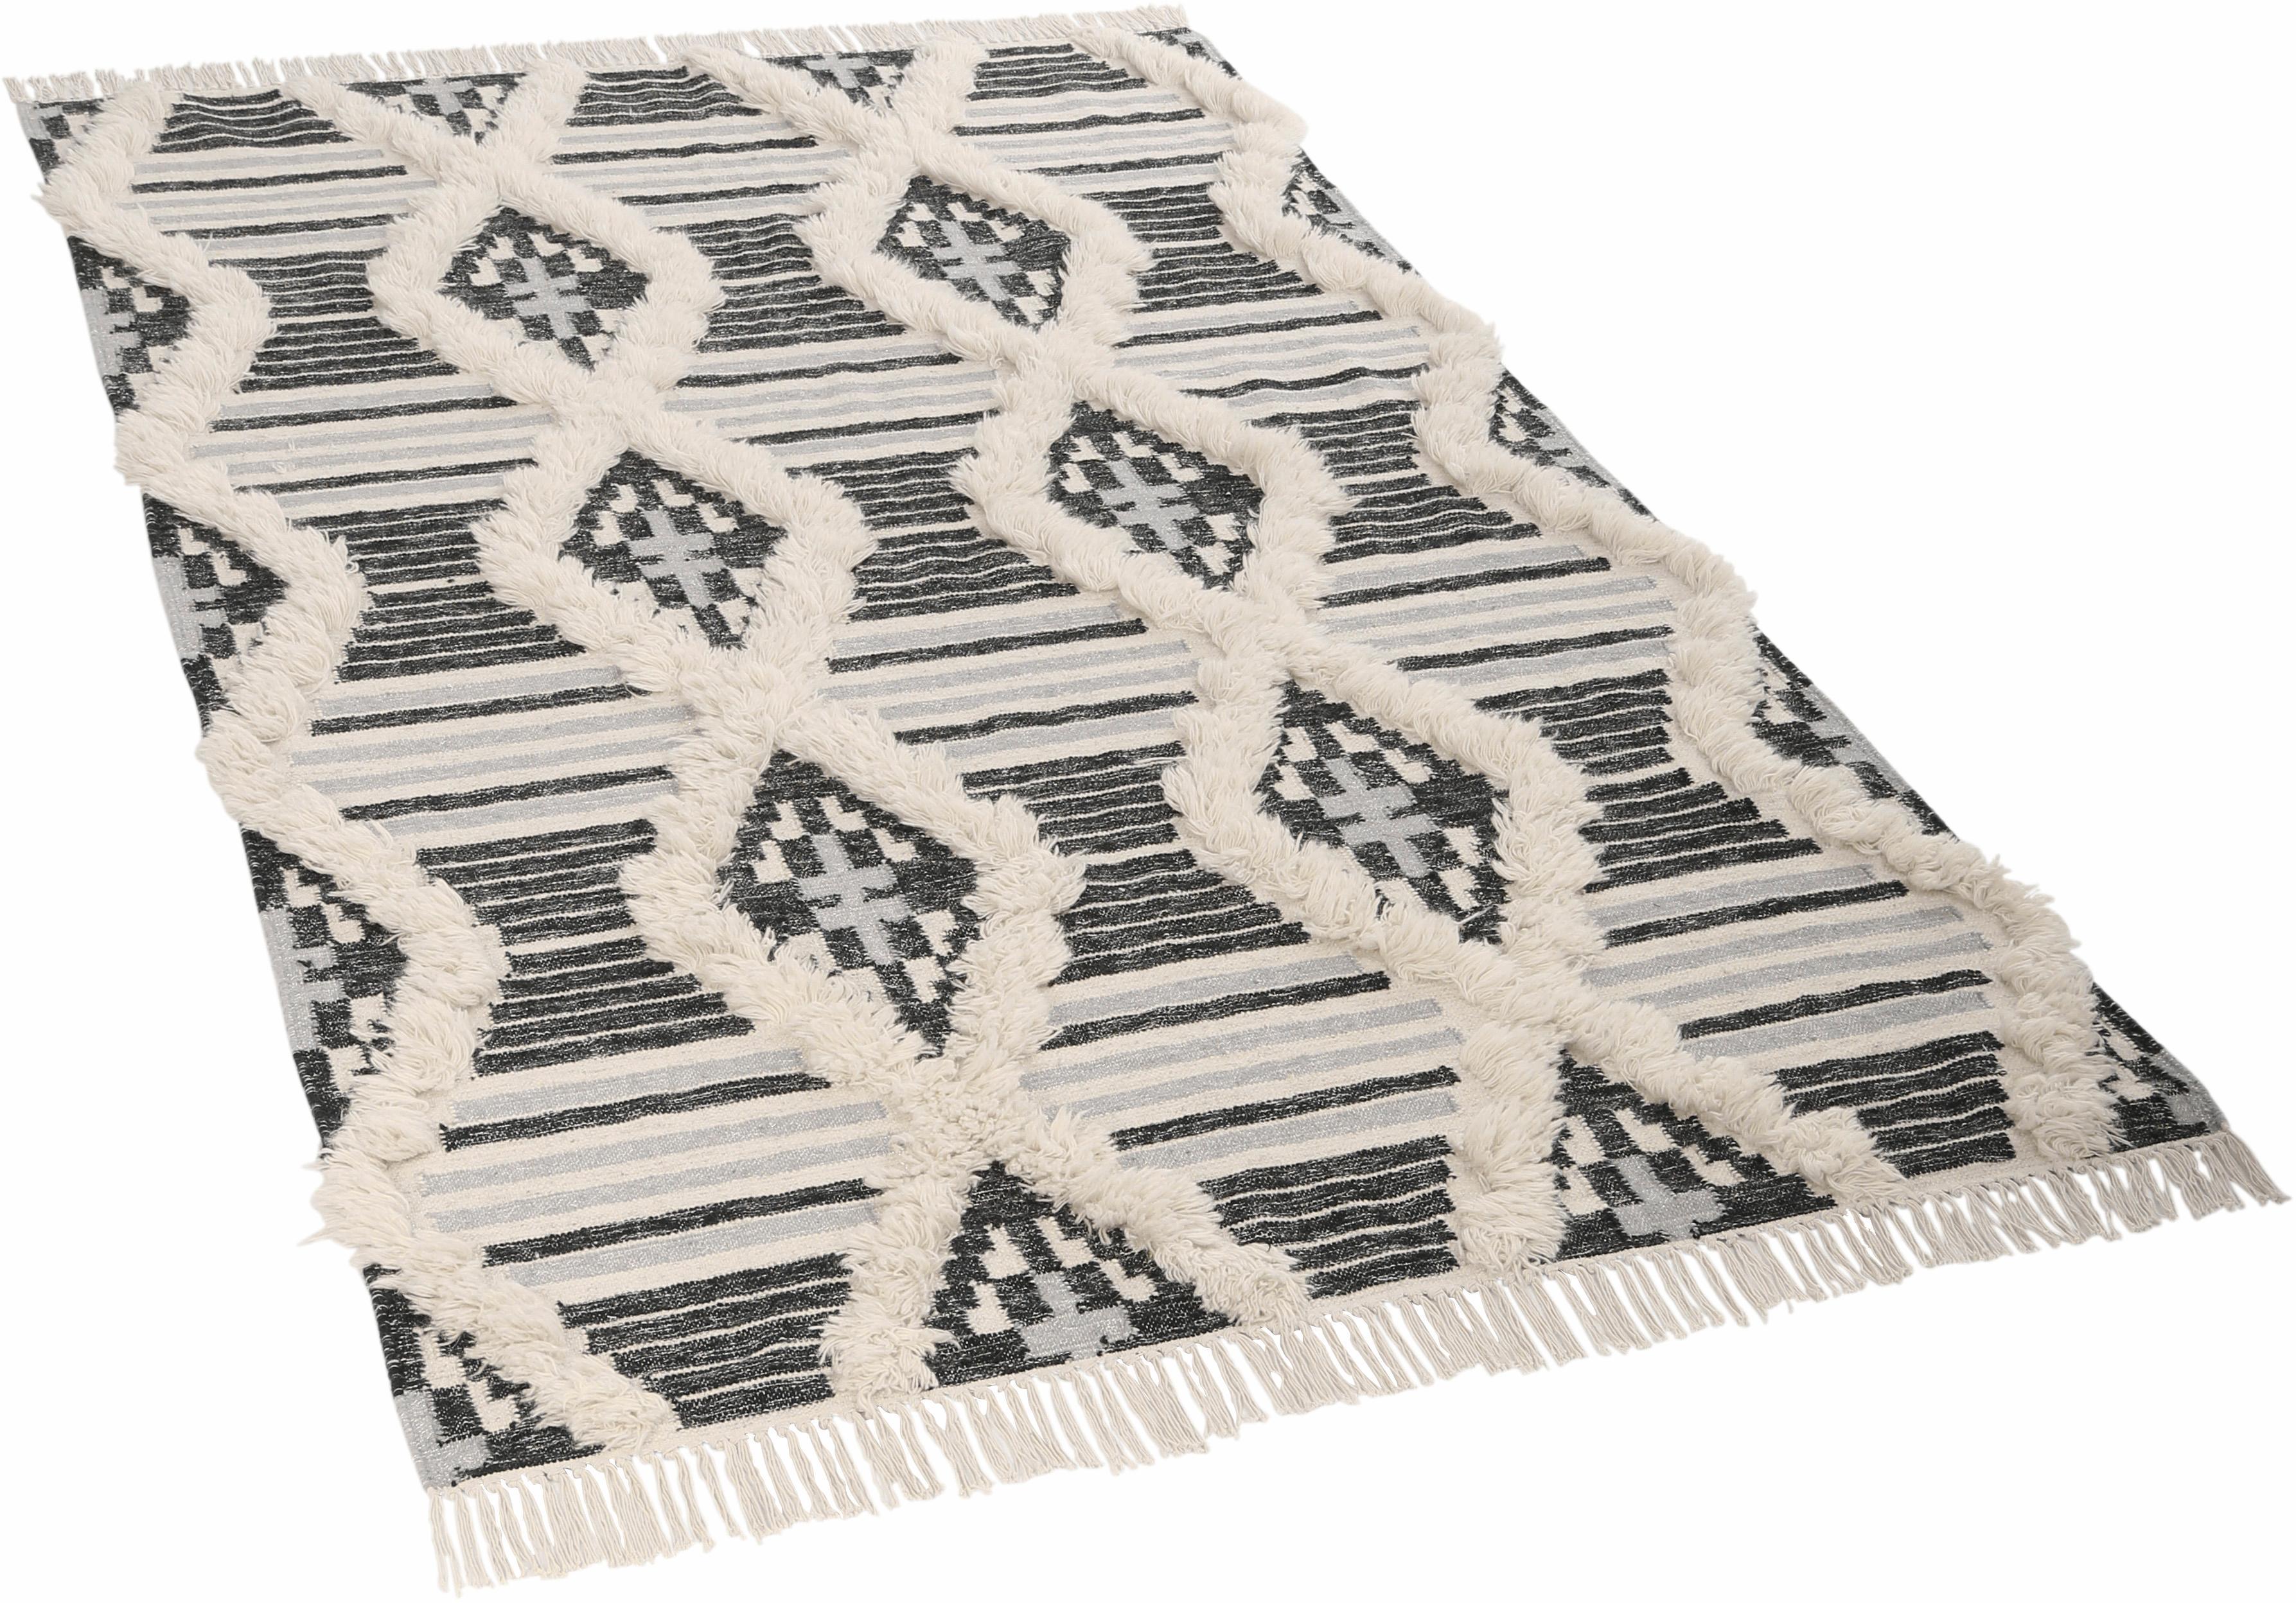 orientteppich cozy kelim tom tailor rechteckig h he. Black Bedroom Furniture Sets. Home Design Ideas